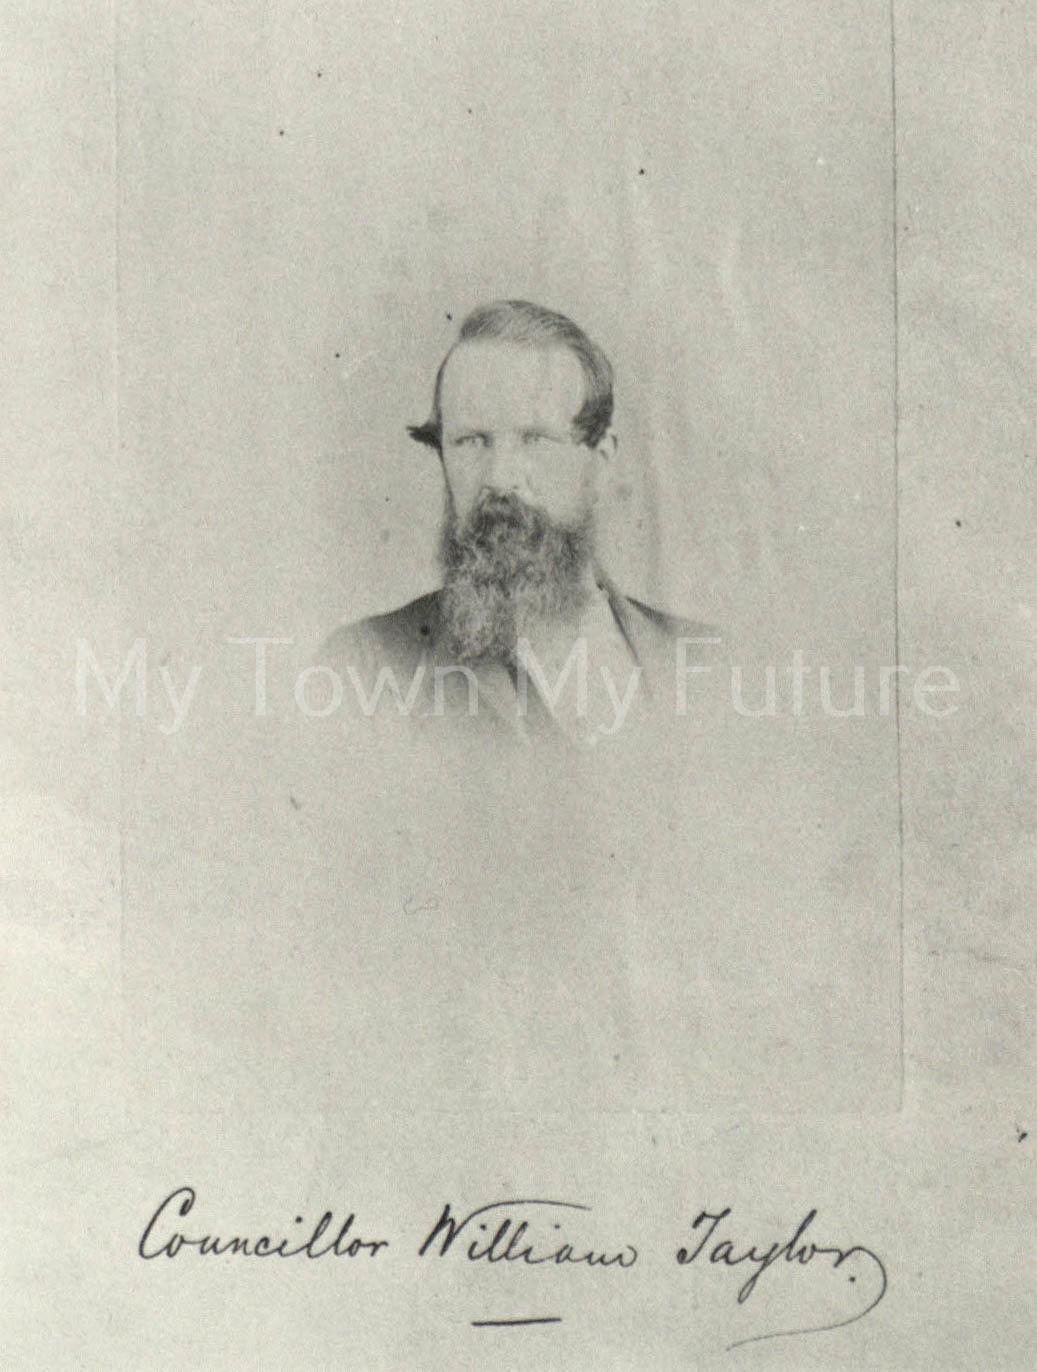 William Lockwood Taylor